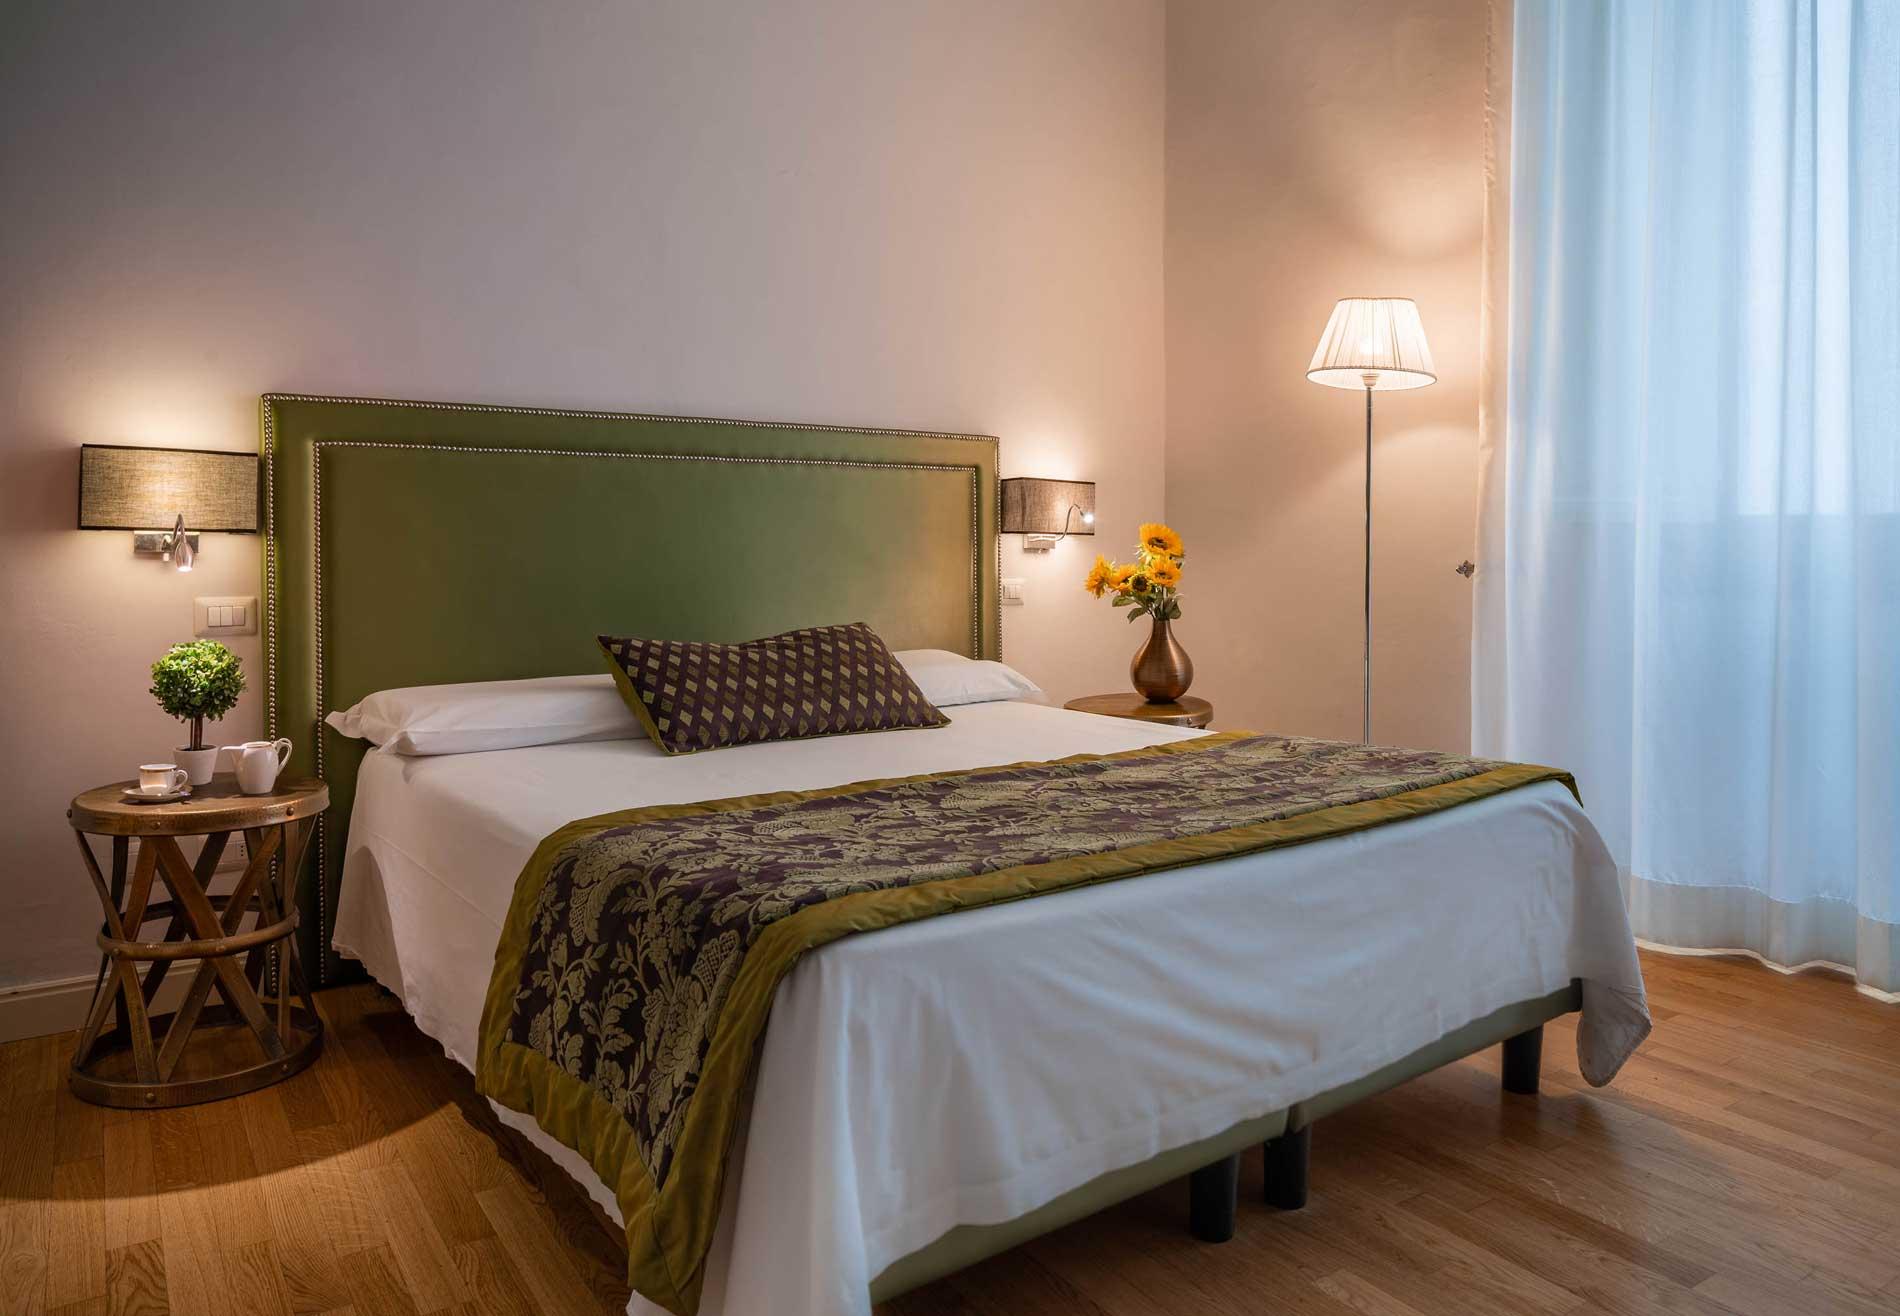 HotelCorso_YML1834-HDR-Pano